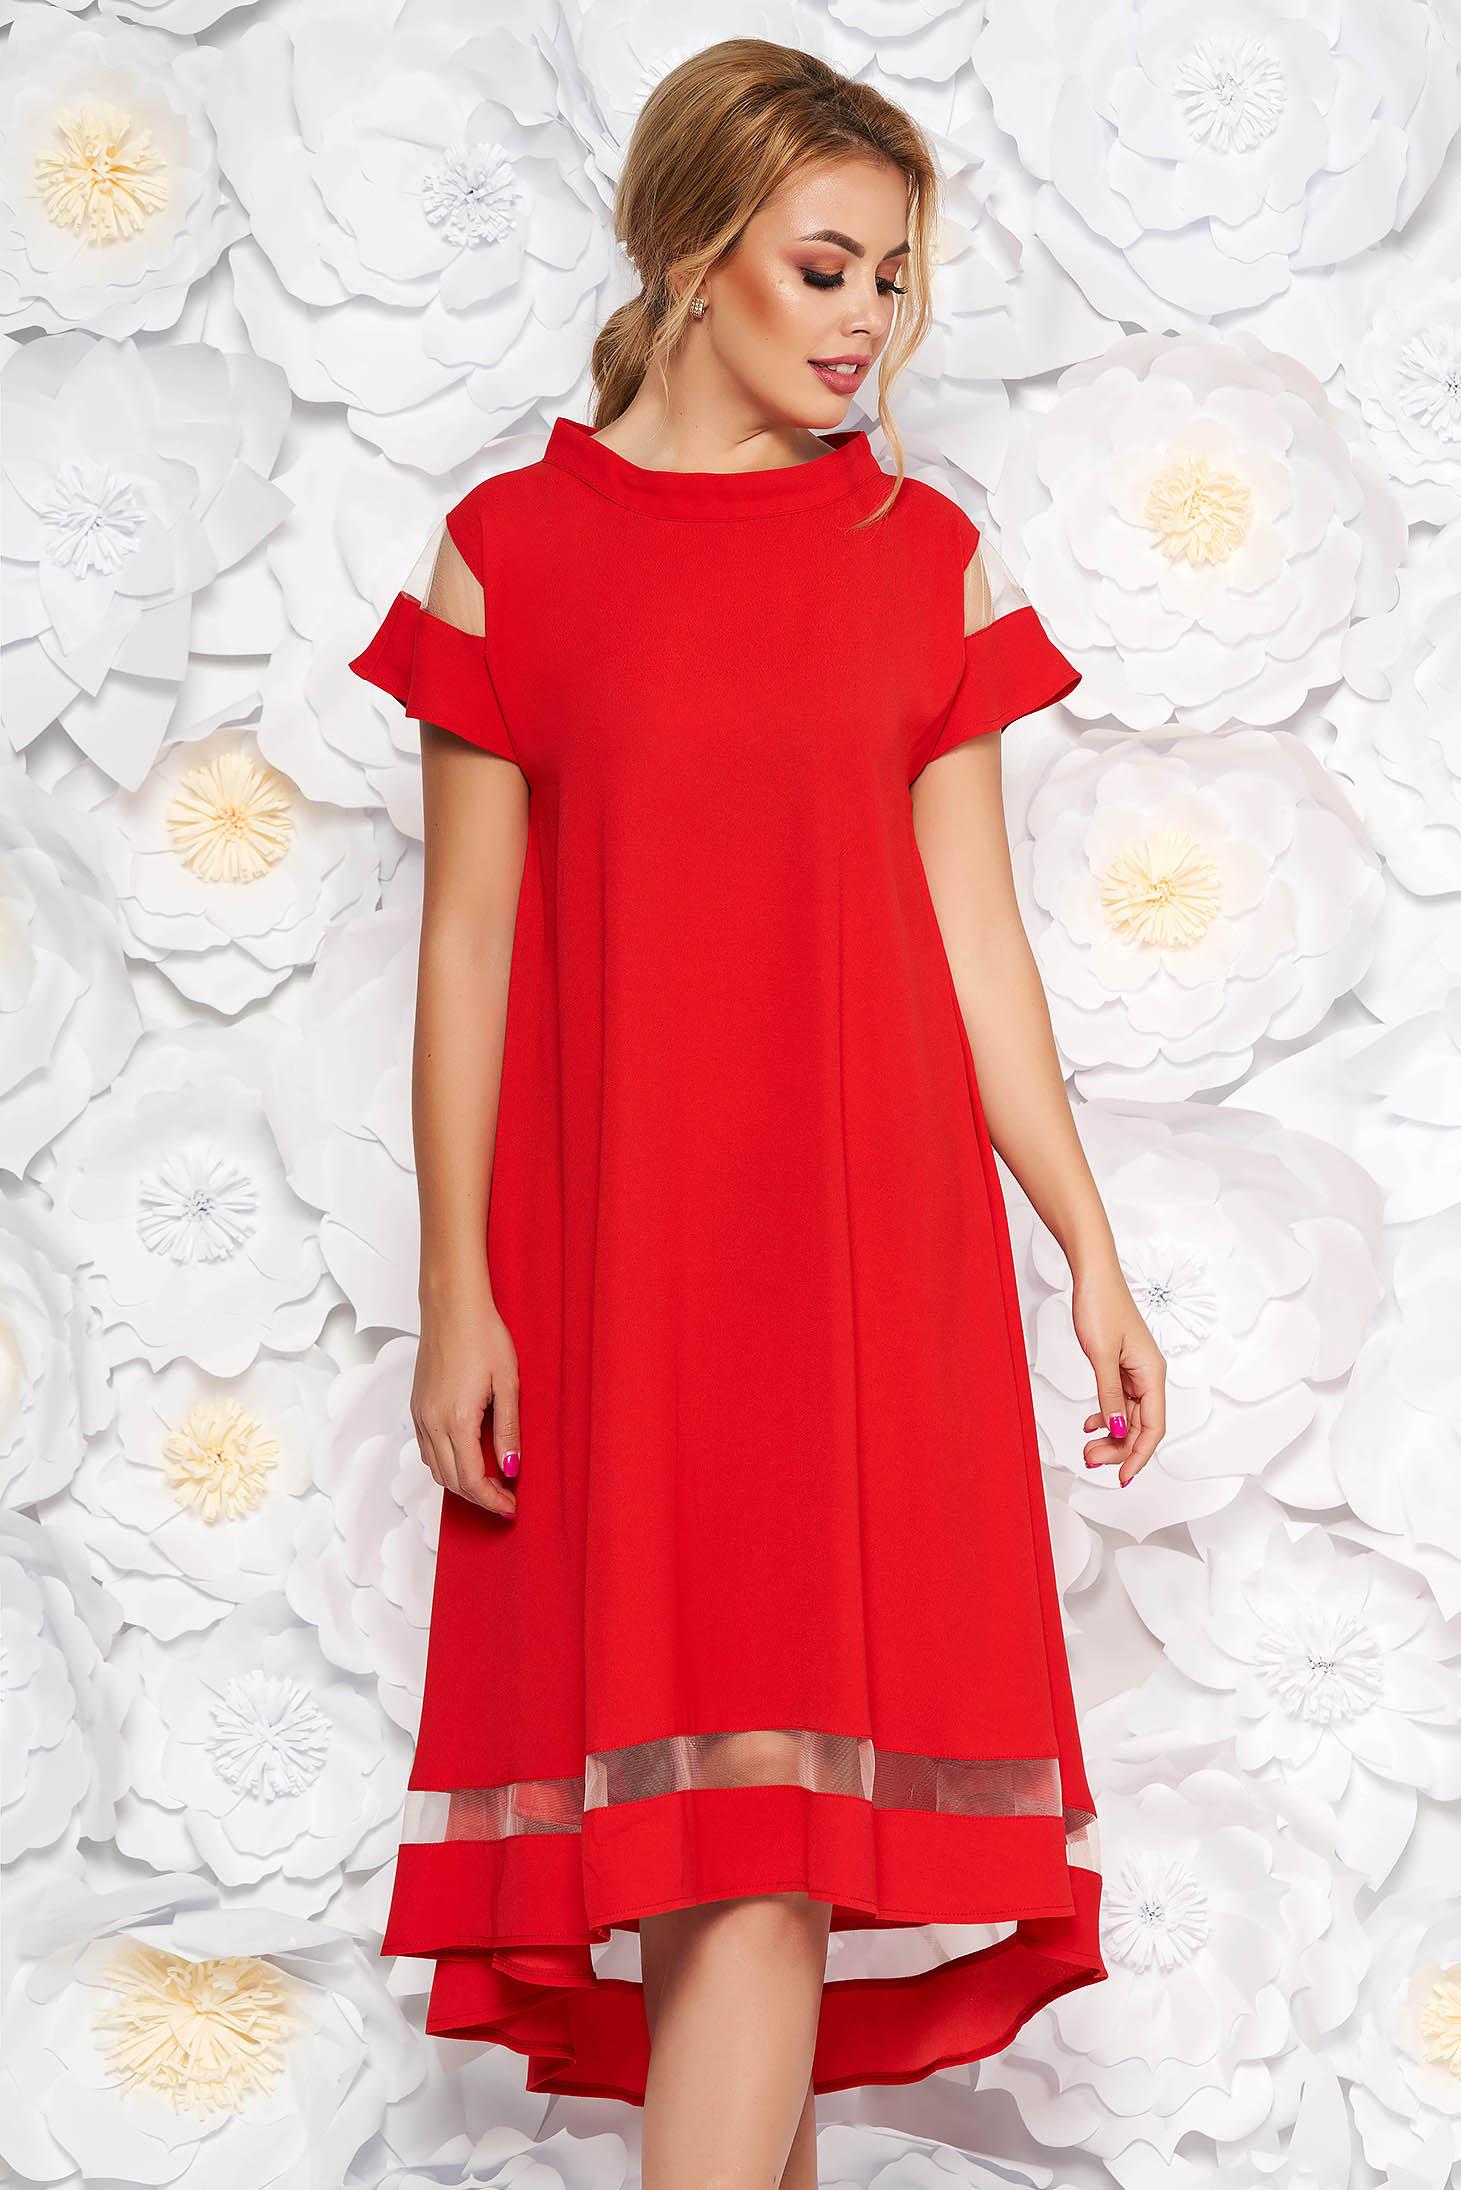 Red elegant flared asymmetrical dress thin fabric short sleeves